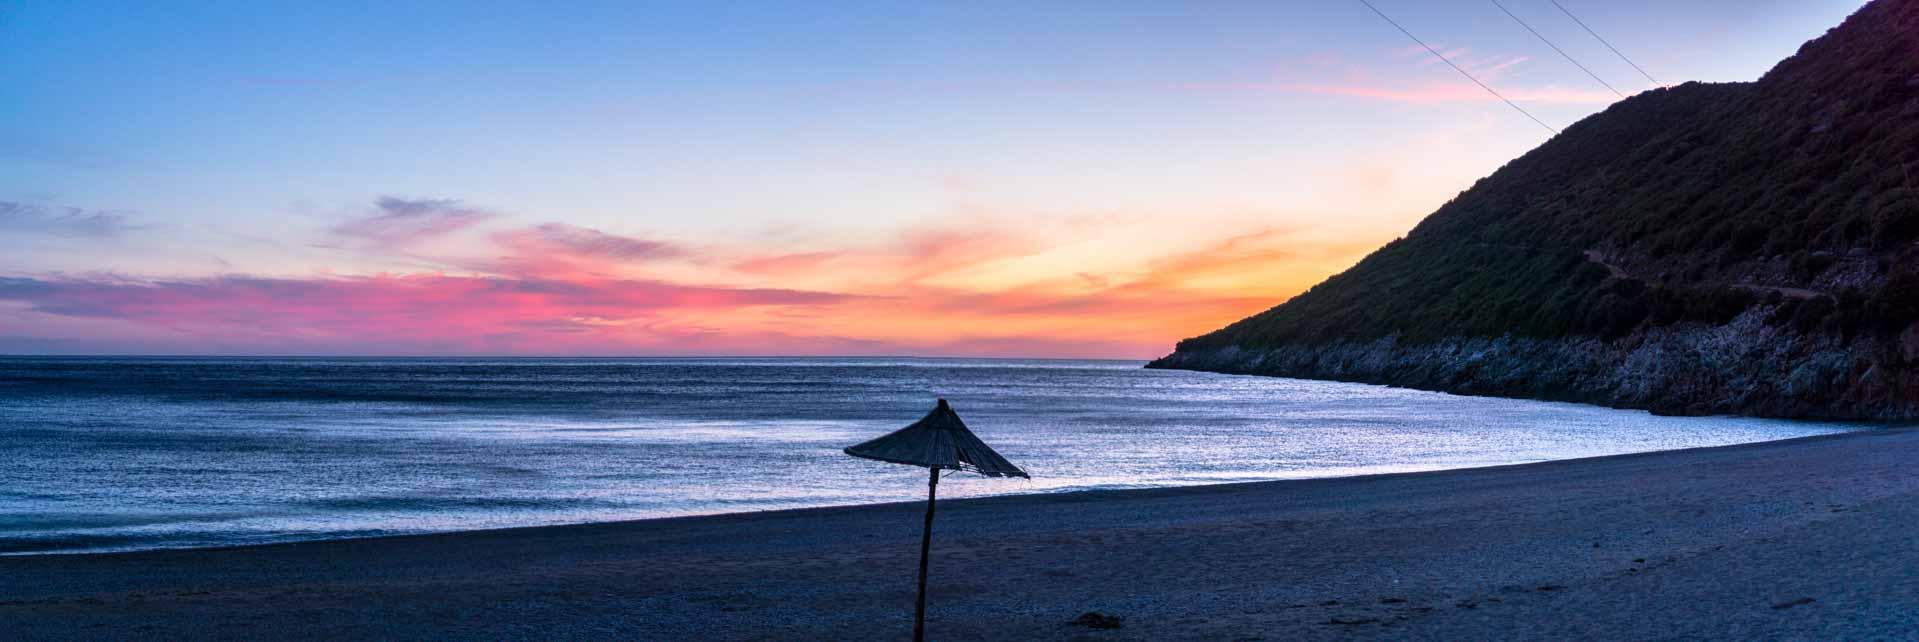 SerialHikers stop autostop world monde tour hitchhiking aventure adventure alternative travel voyage sans avion no fly albanie gjipe albania cove crique beach